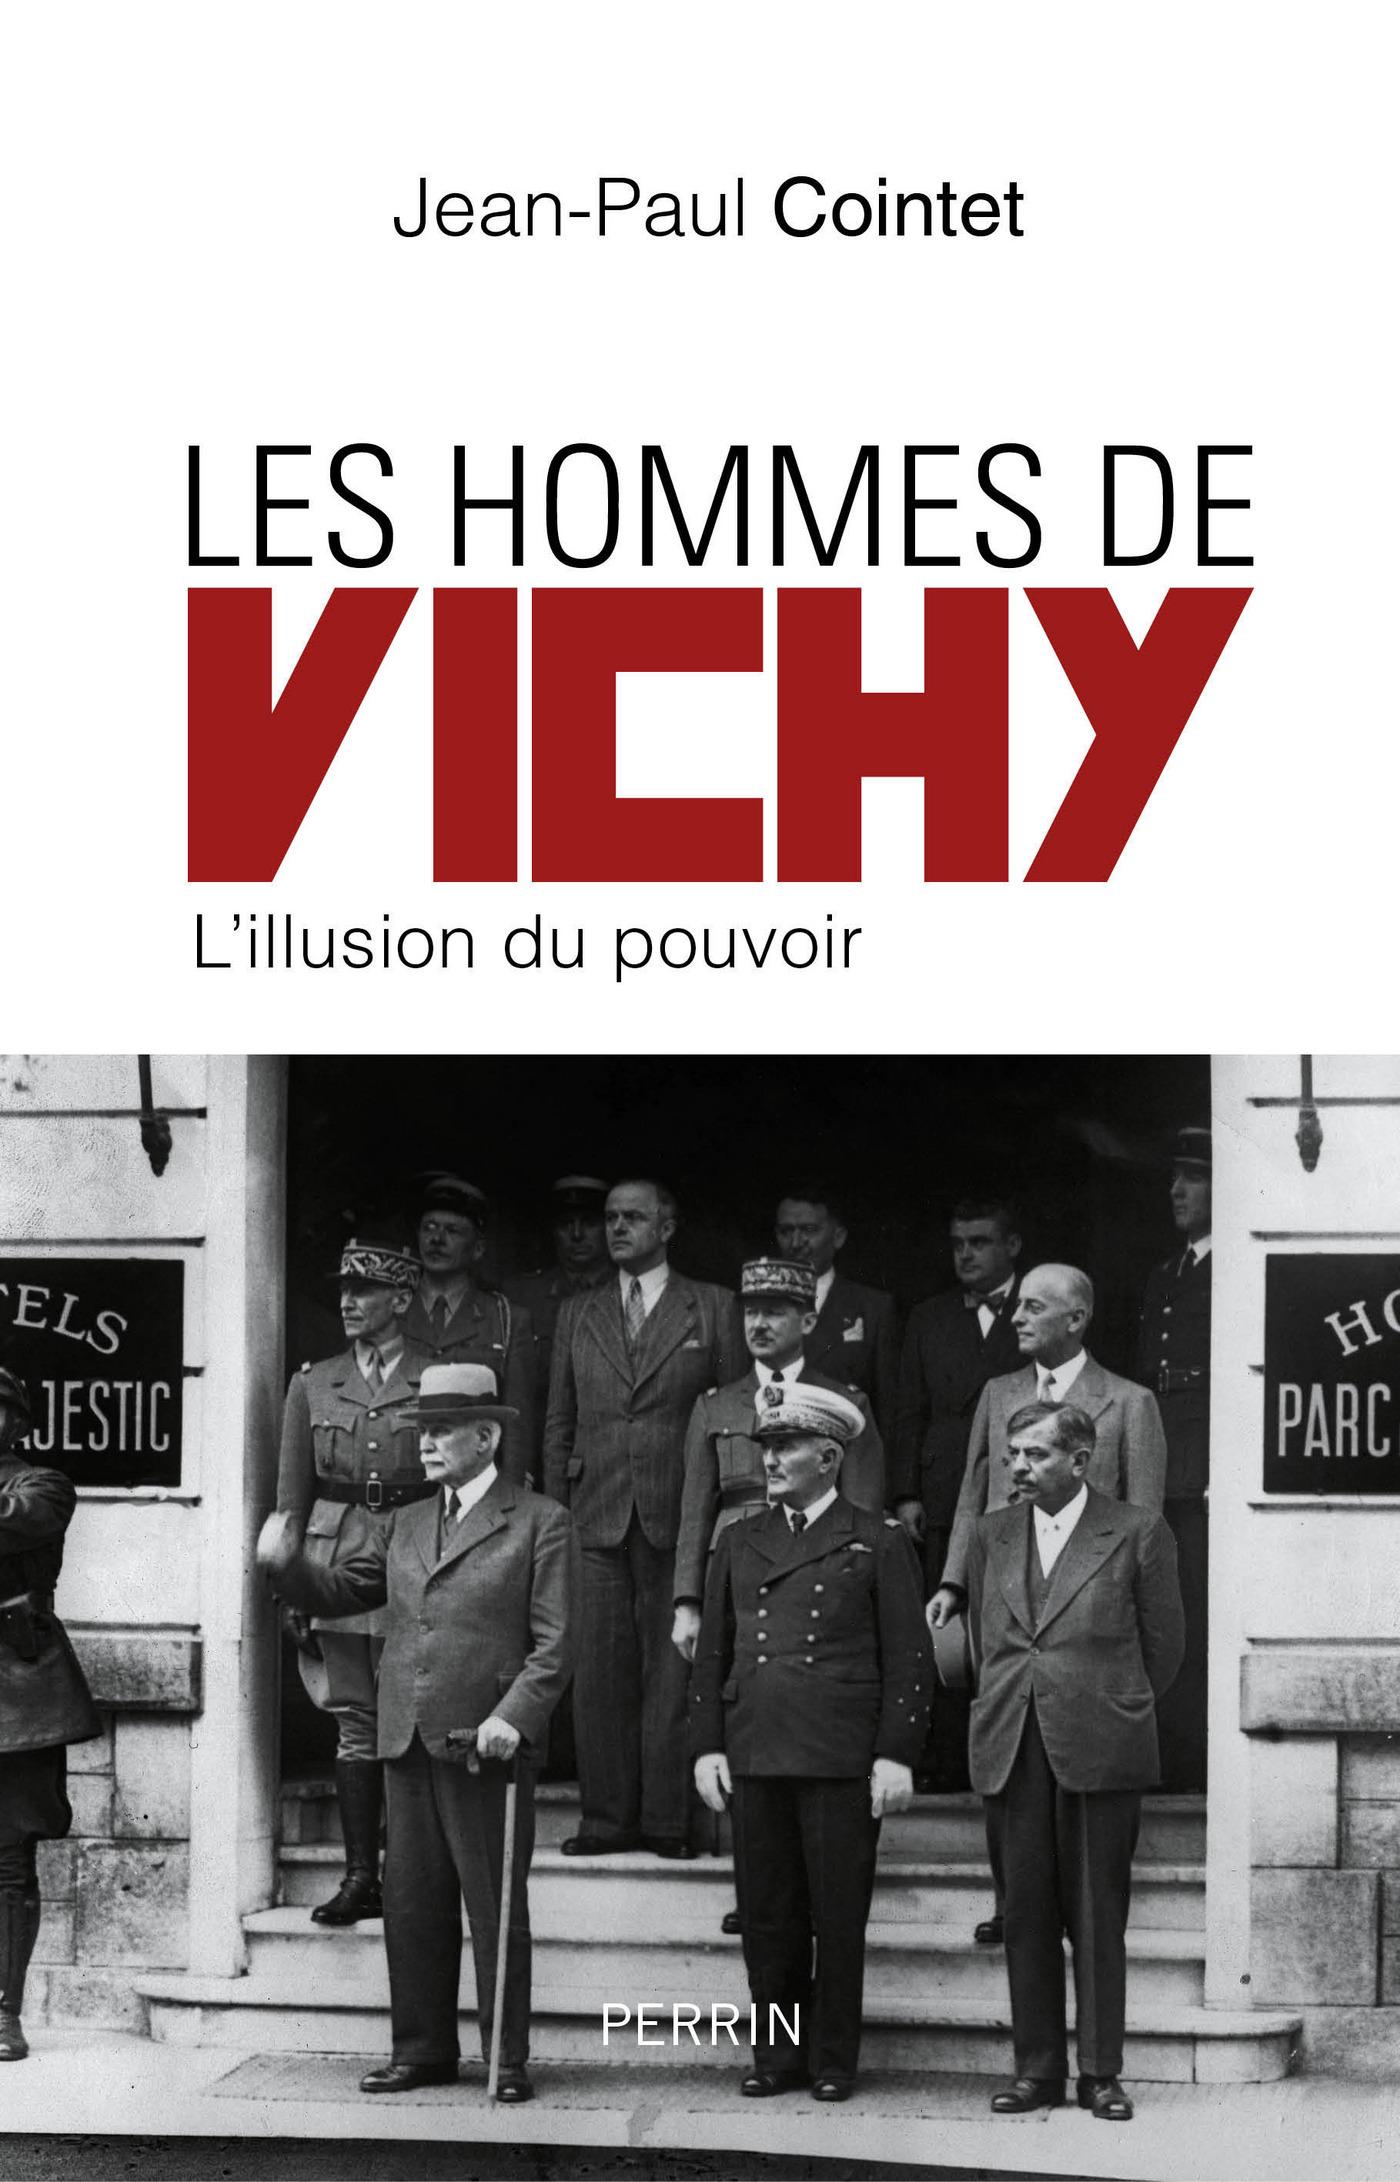 Les hommes de Vichy (ebook)